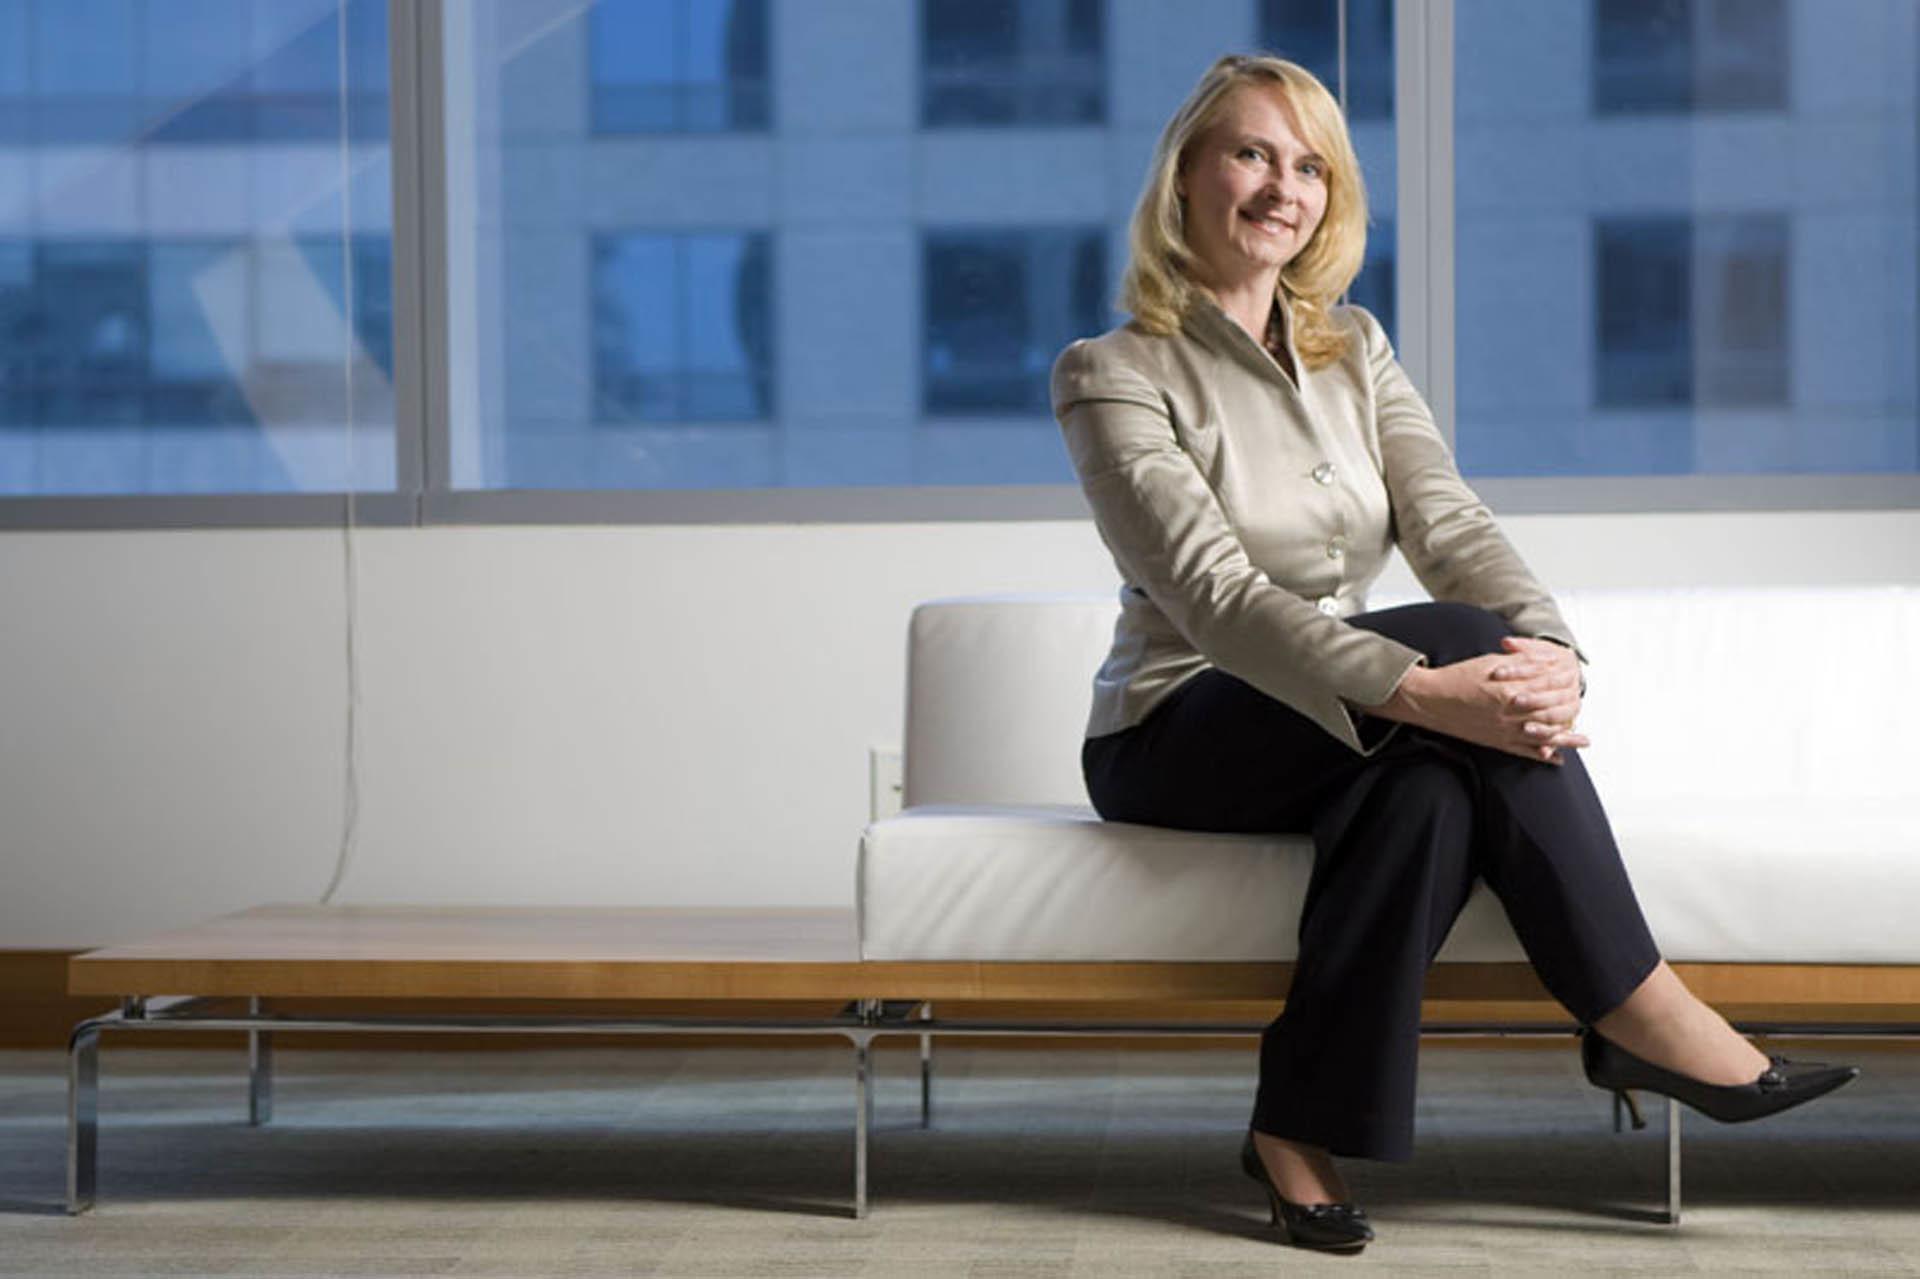 Cindy Cwik, Litigation Attorney with San Diego's Latham & Watkins